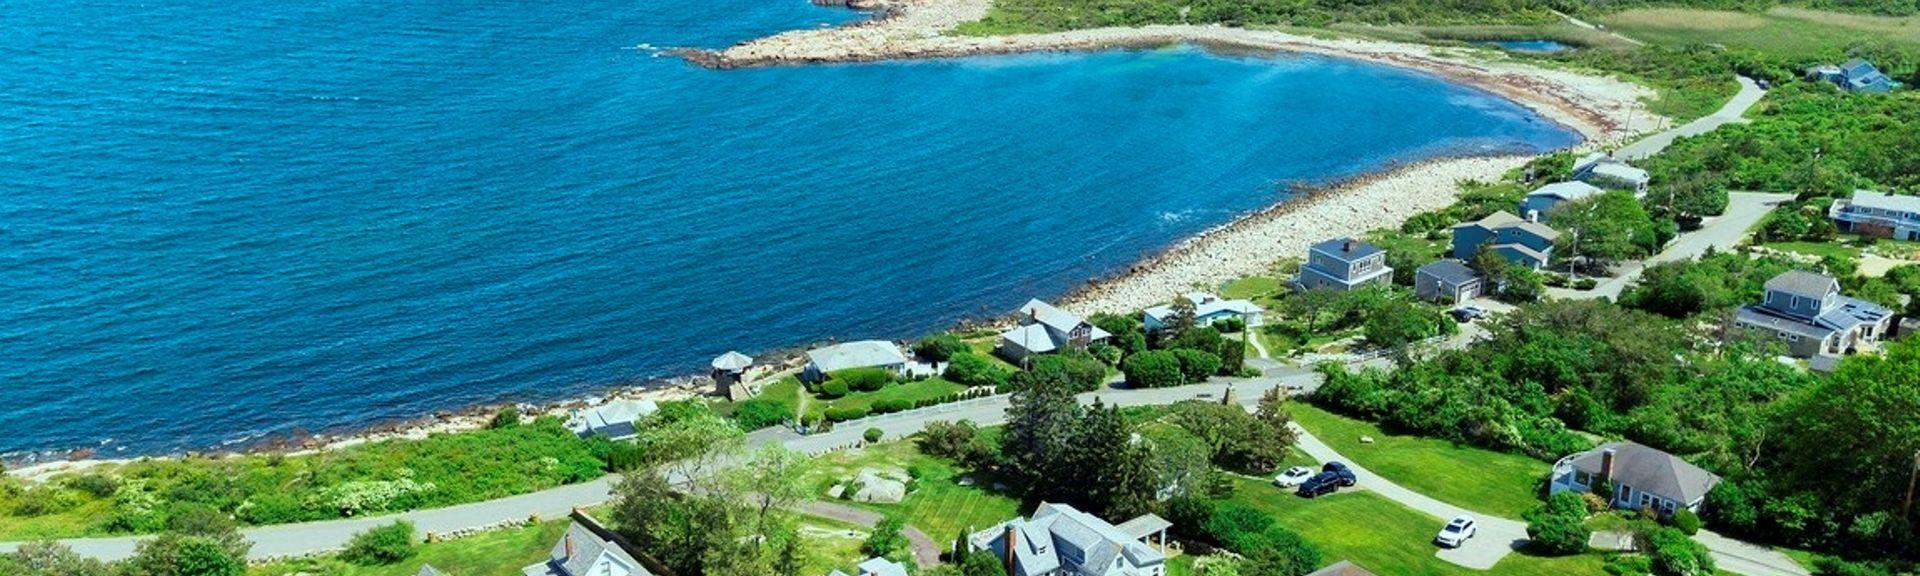 Pebble Beach, Rockport, Massachusetts, United States of America